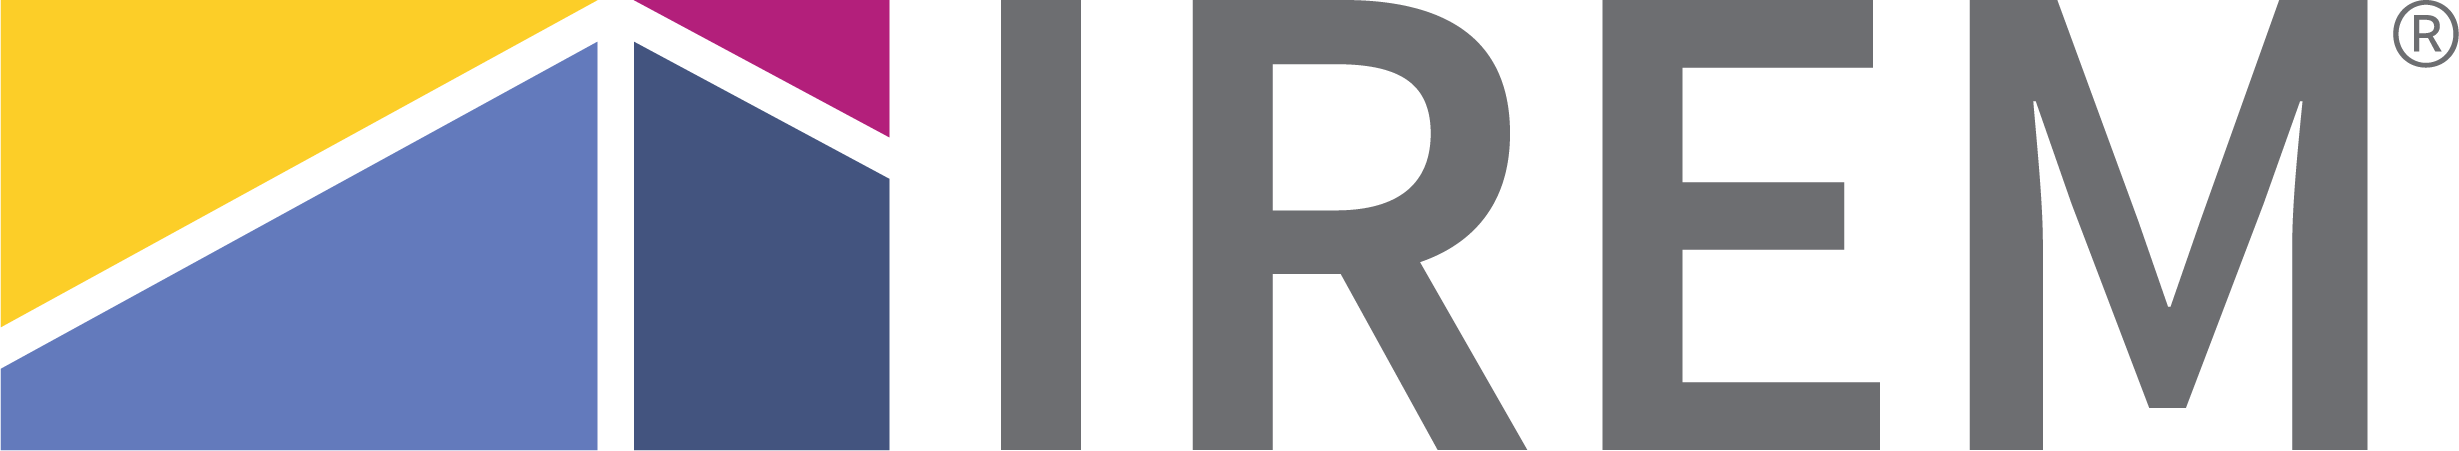 IREM Acronym Logo - CMYK copy